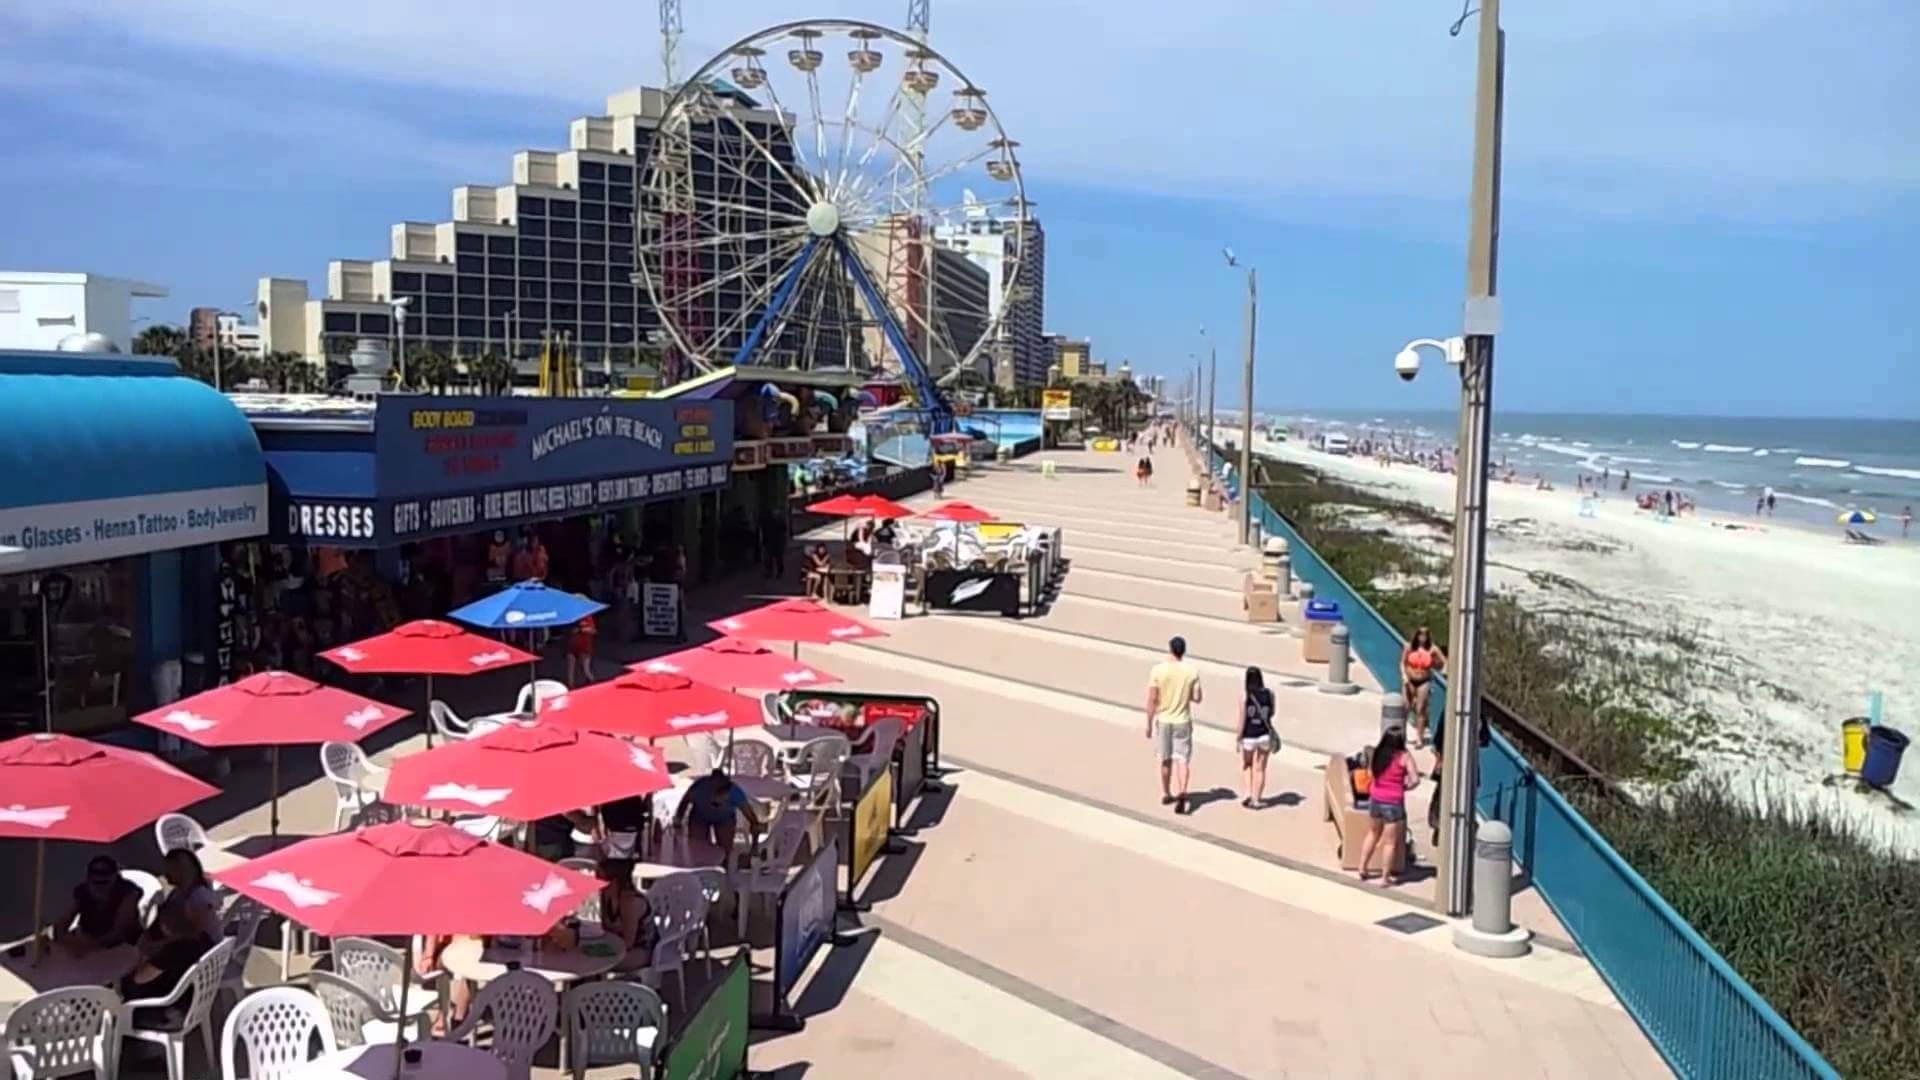 Pontos turísticos em Daytona Beach: Daytona Beach Pier and Boardwalk